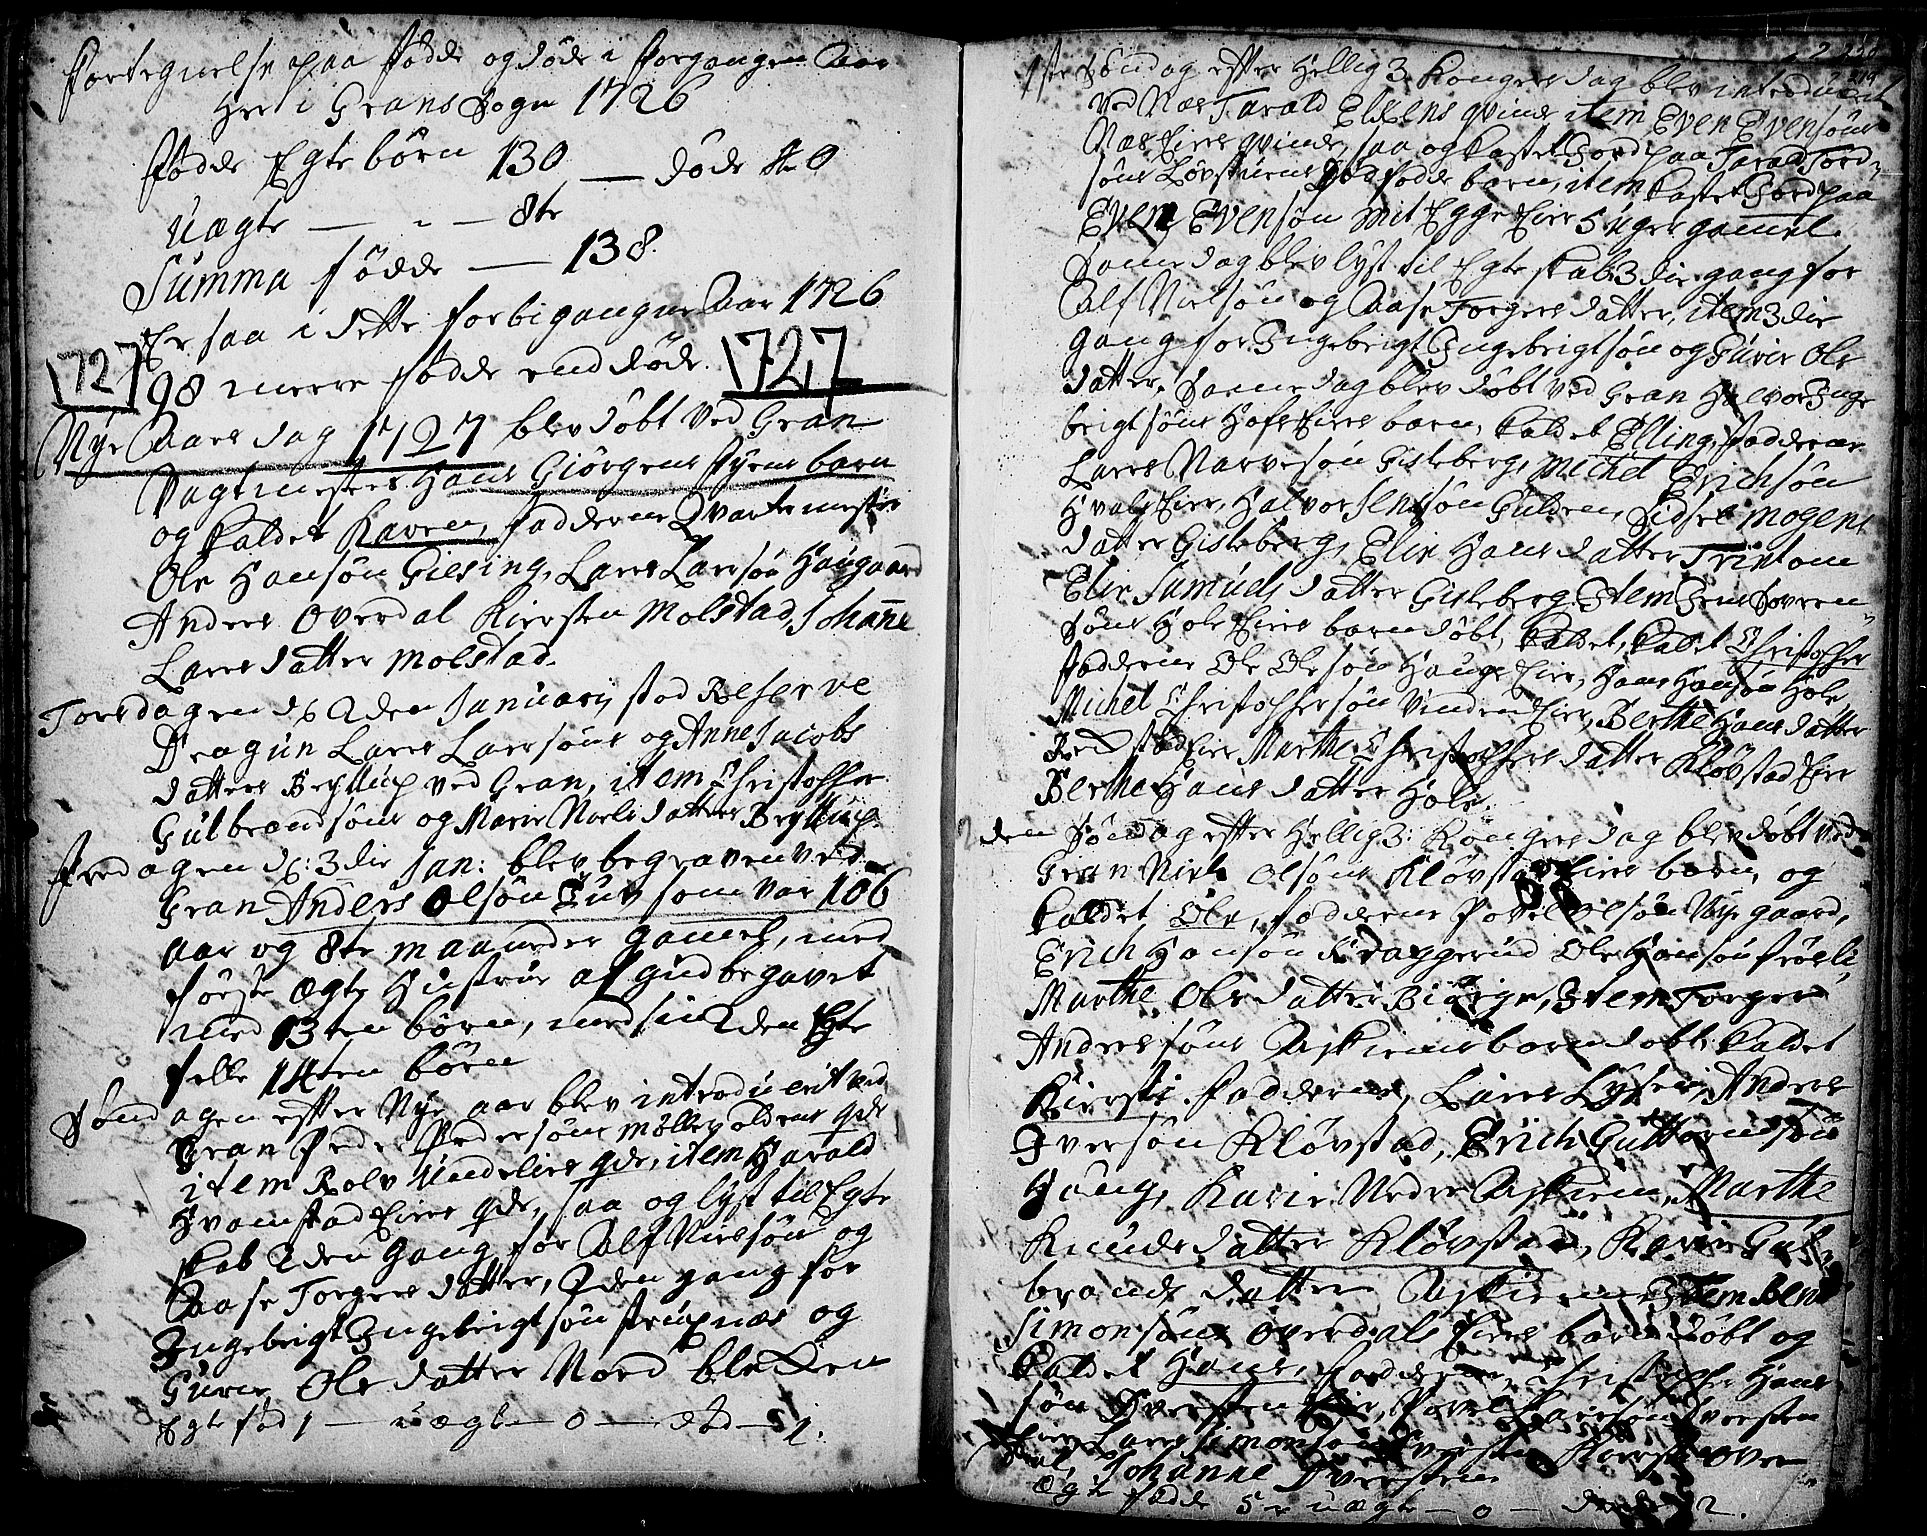 SAH, Gran prestekontor, Ministerialbok nr. 1, 1707-1731, s. 219